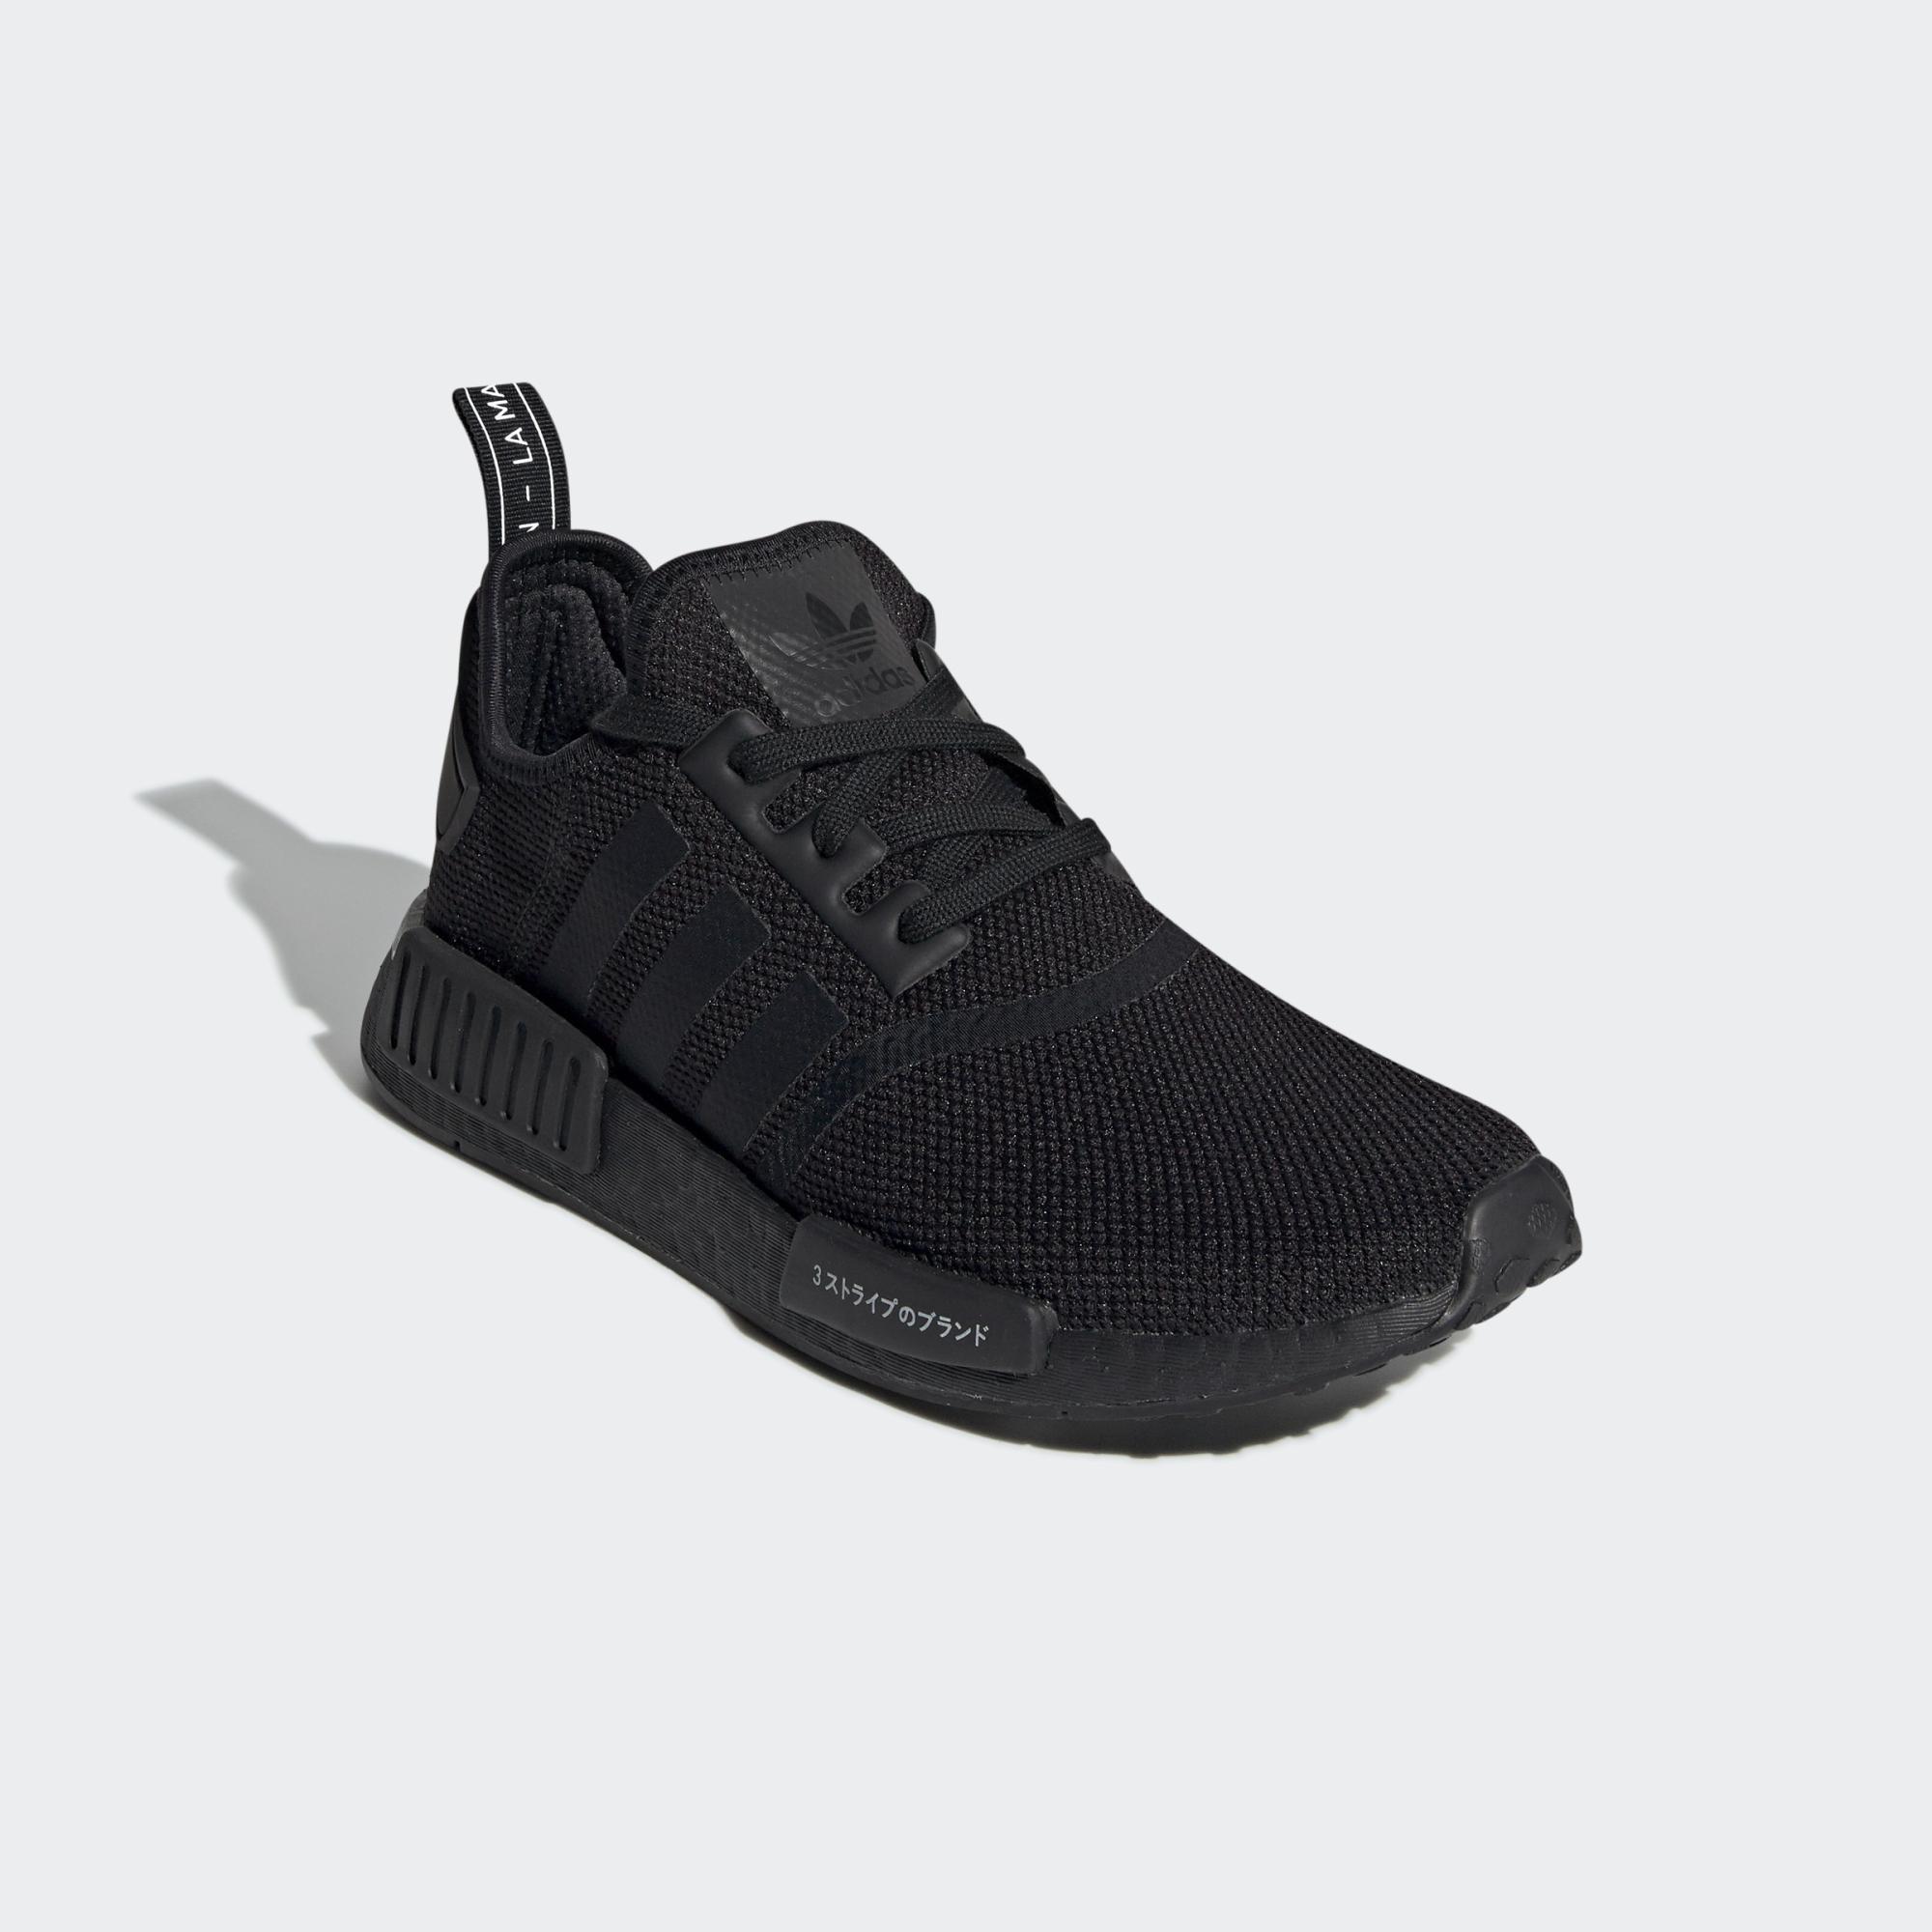 【ADIDAS】Original NMD_R1 黑色 男 休閒鞋 慢跑鞋 BD7754 (Palace store) 1